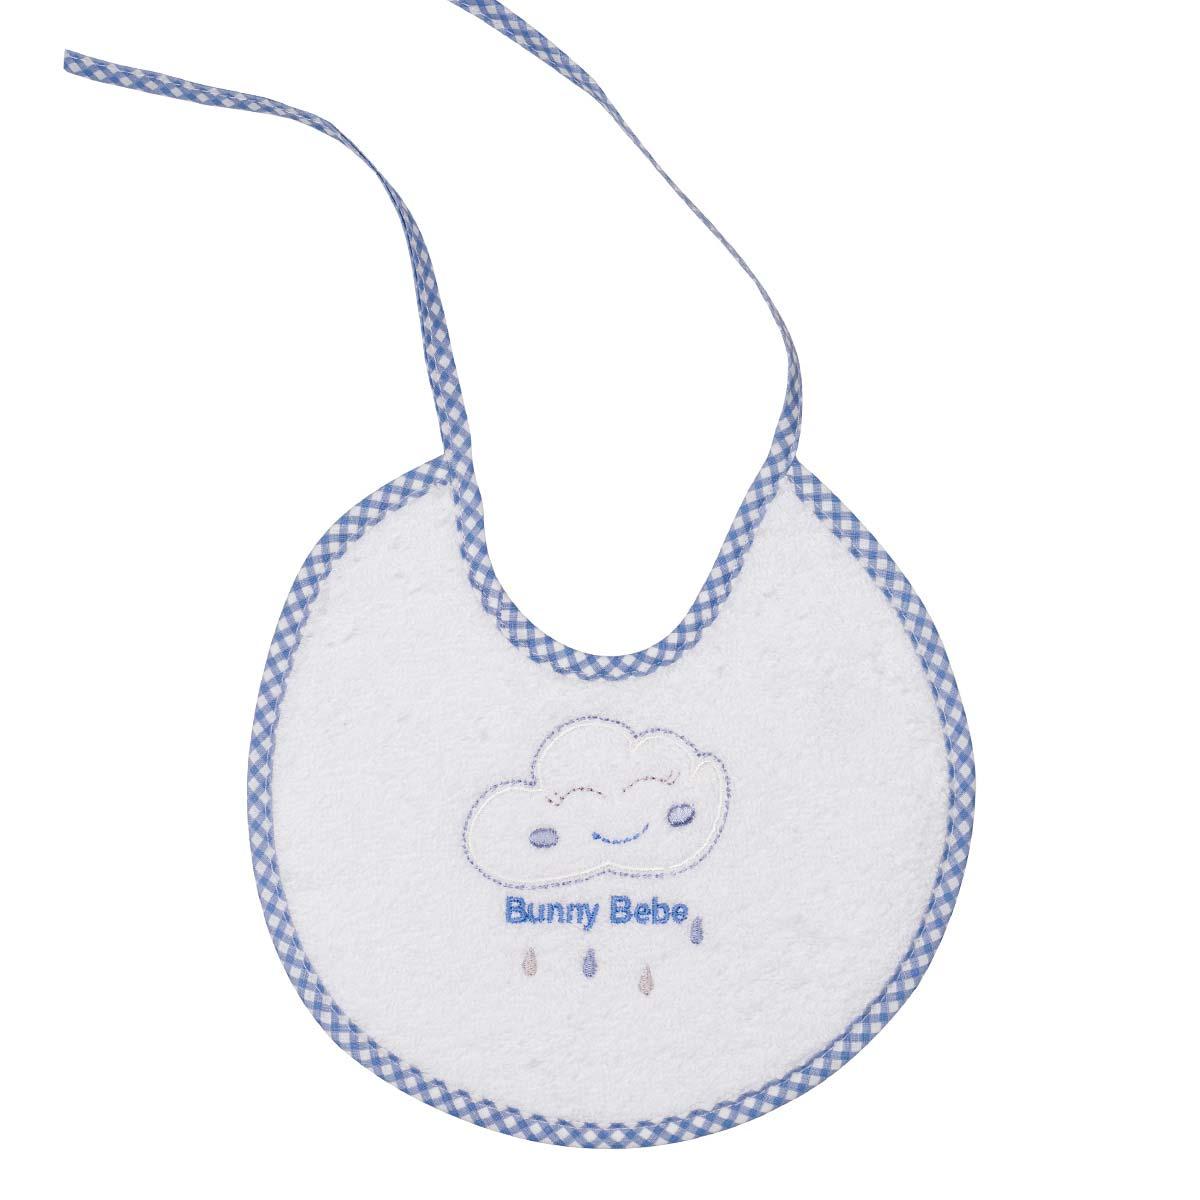 Bunny bebe σαλιάρα πετσετέ με ρέλι σύννεφο μπλε